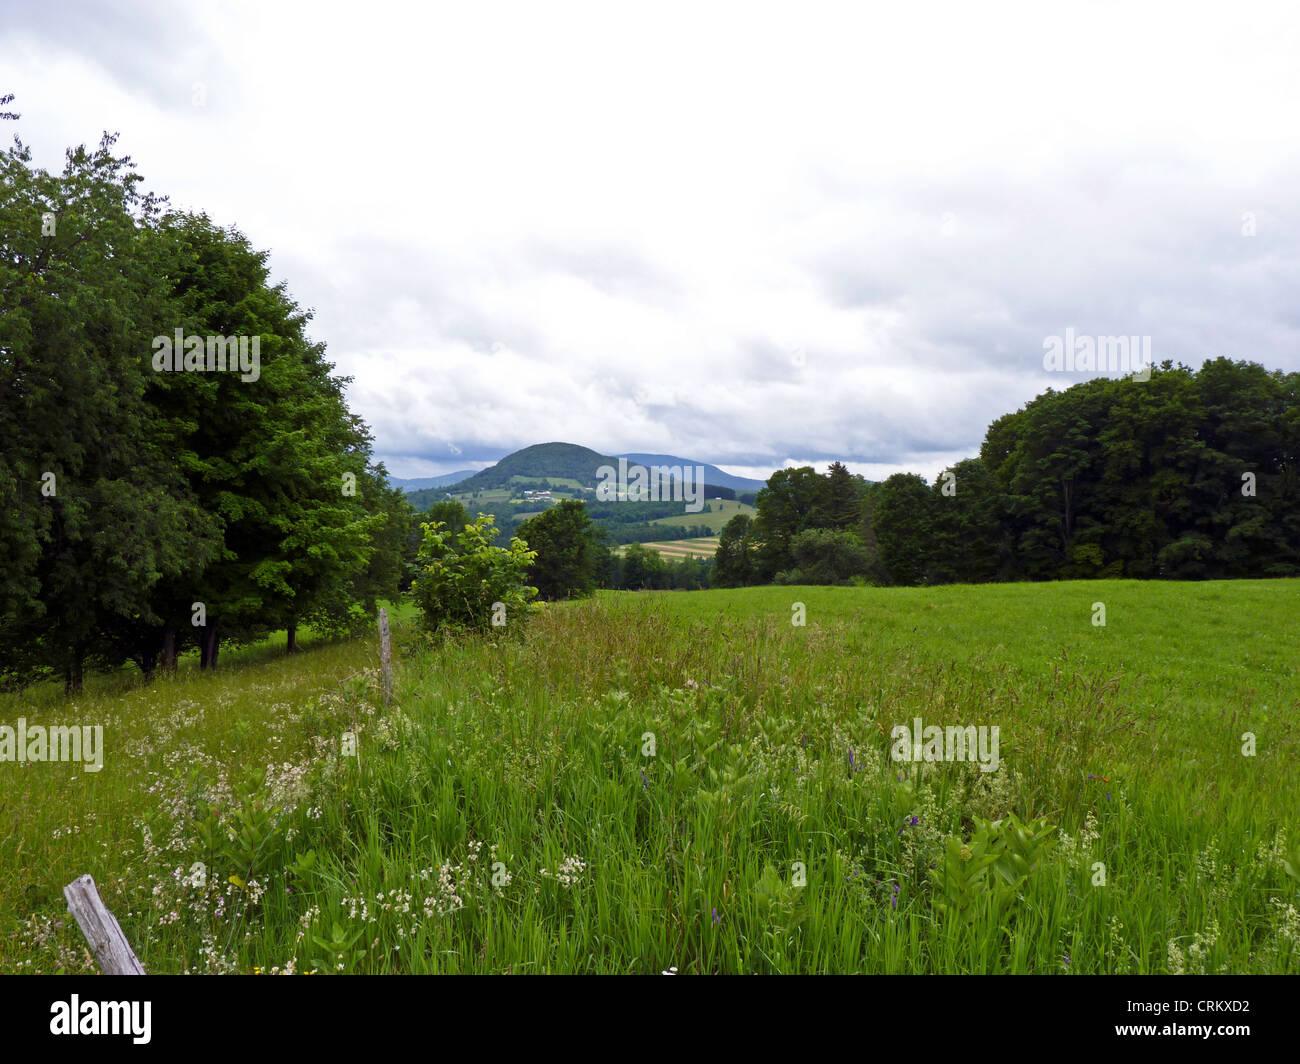 View of Northeast Kingdom in rural Vermont, Peacham Vermont, USA - Stock Image